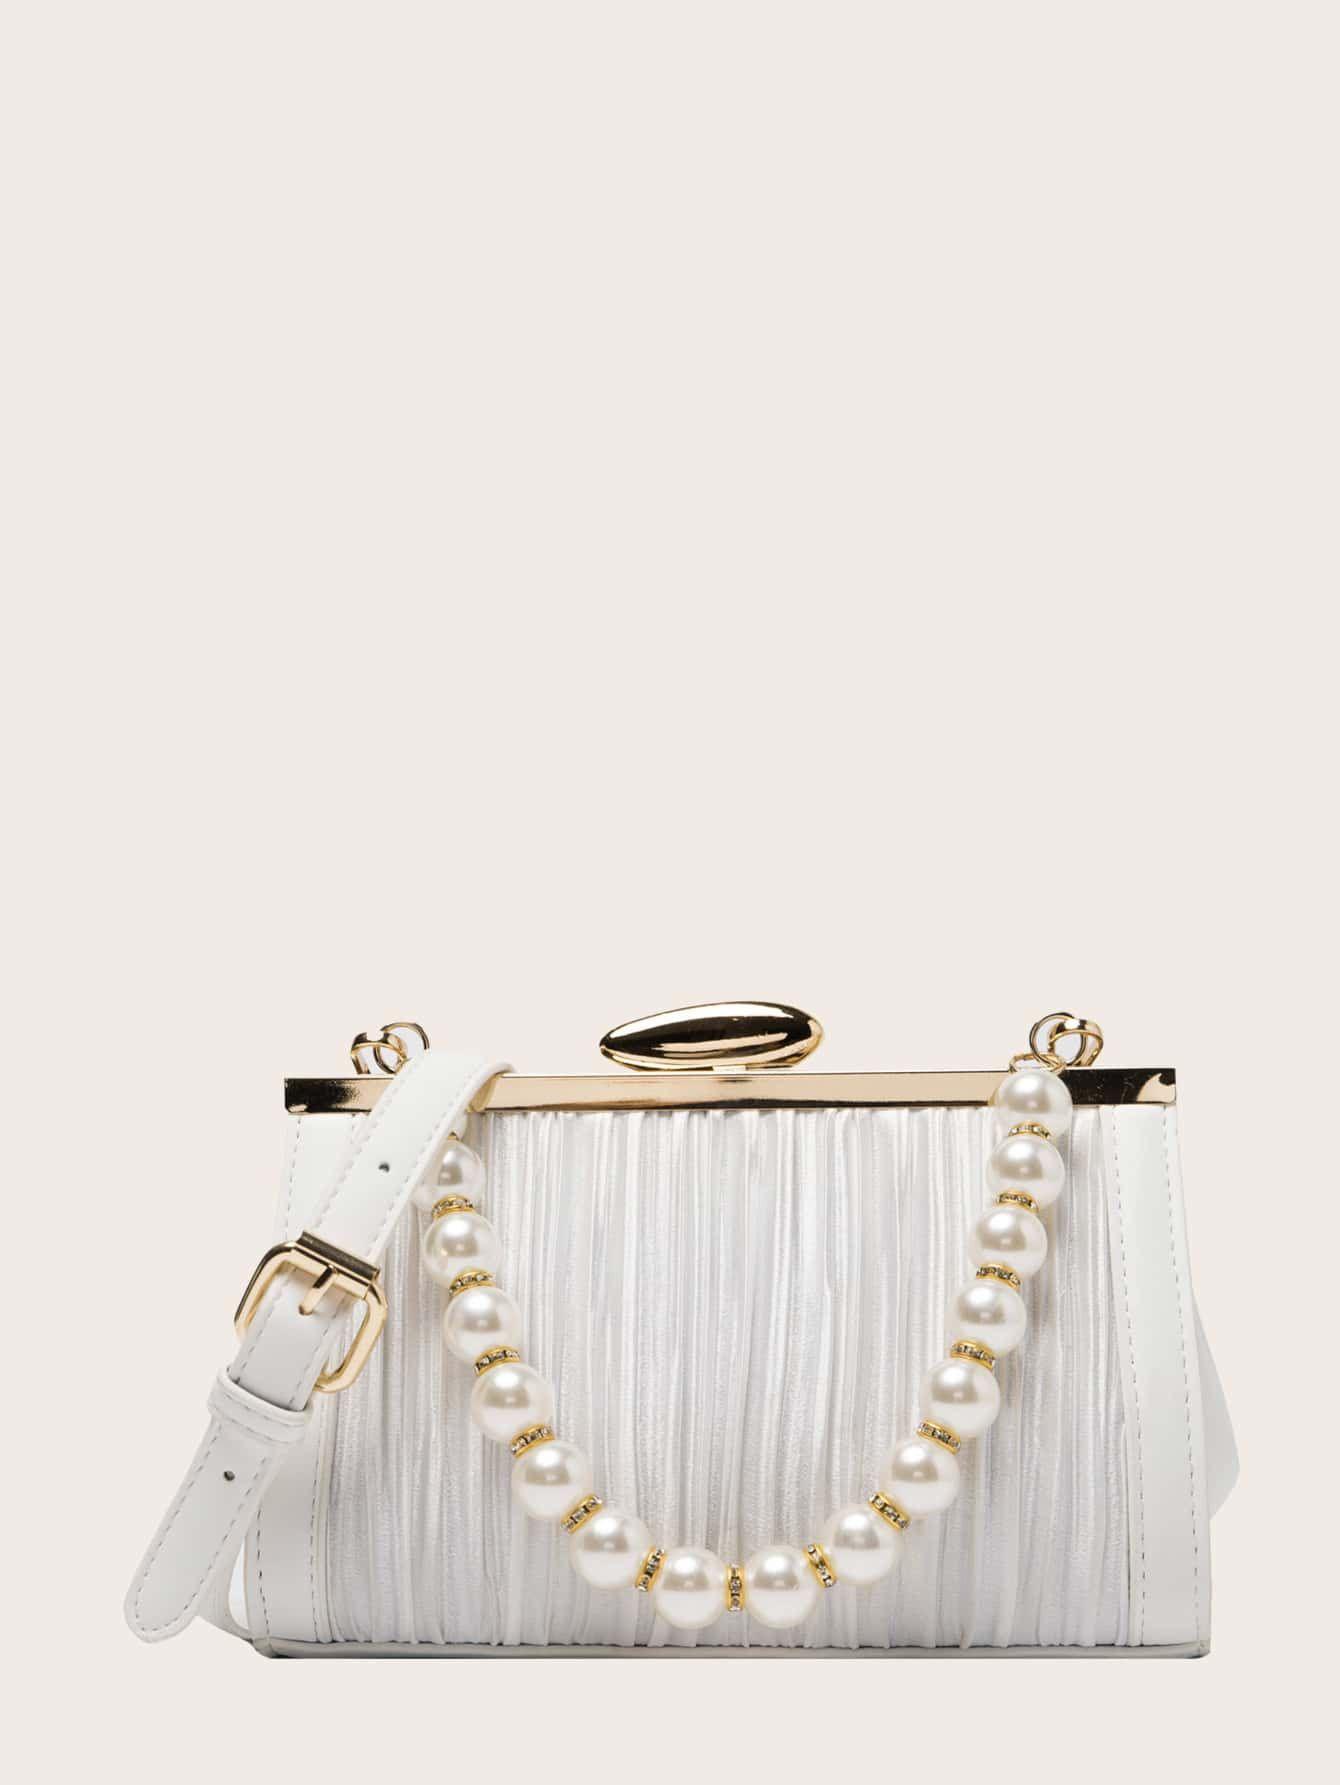 Pin By Ghenima On Coco Chantal In 2020 Clutch Bag Bags Clutch